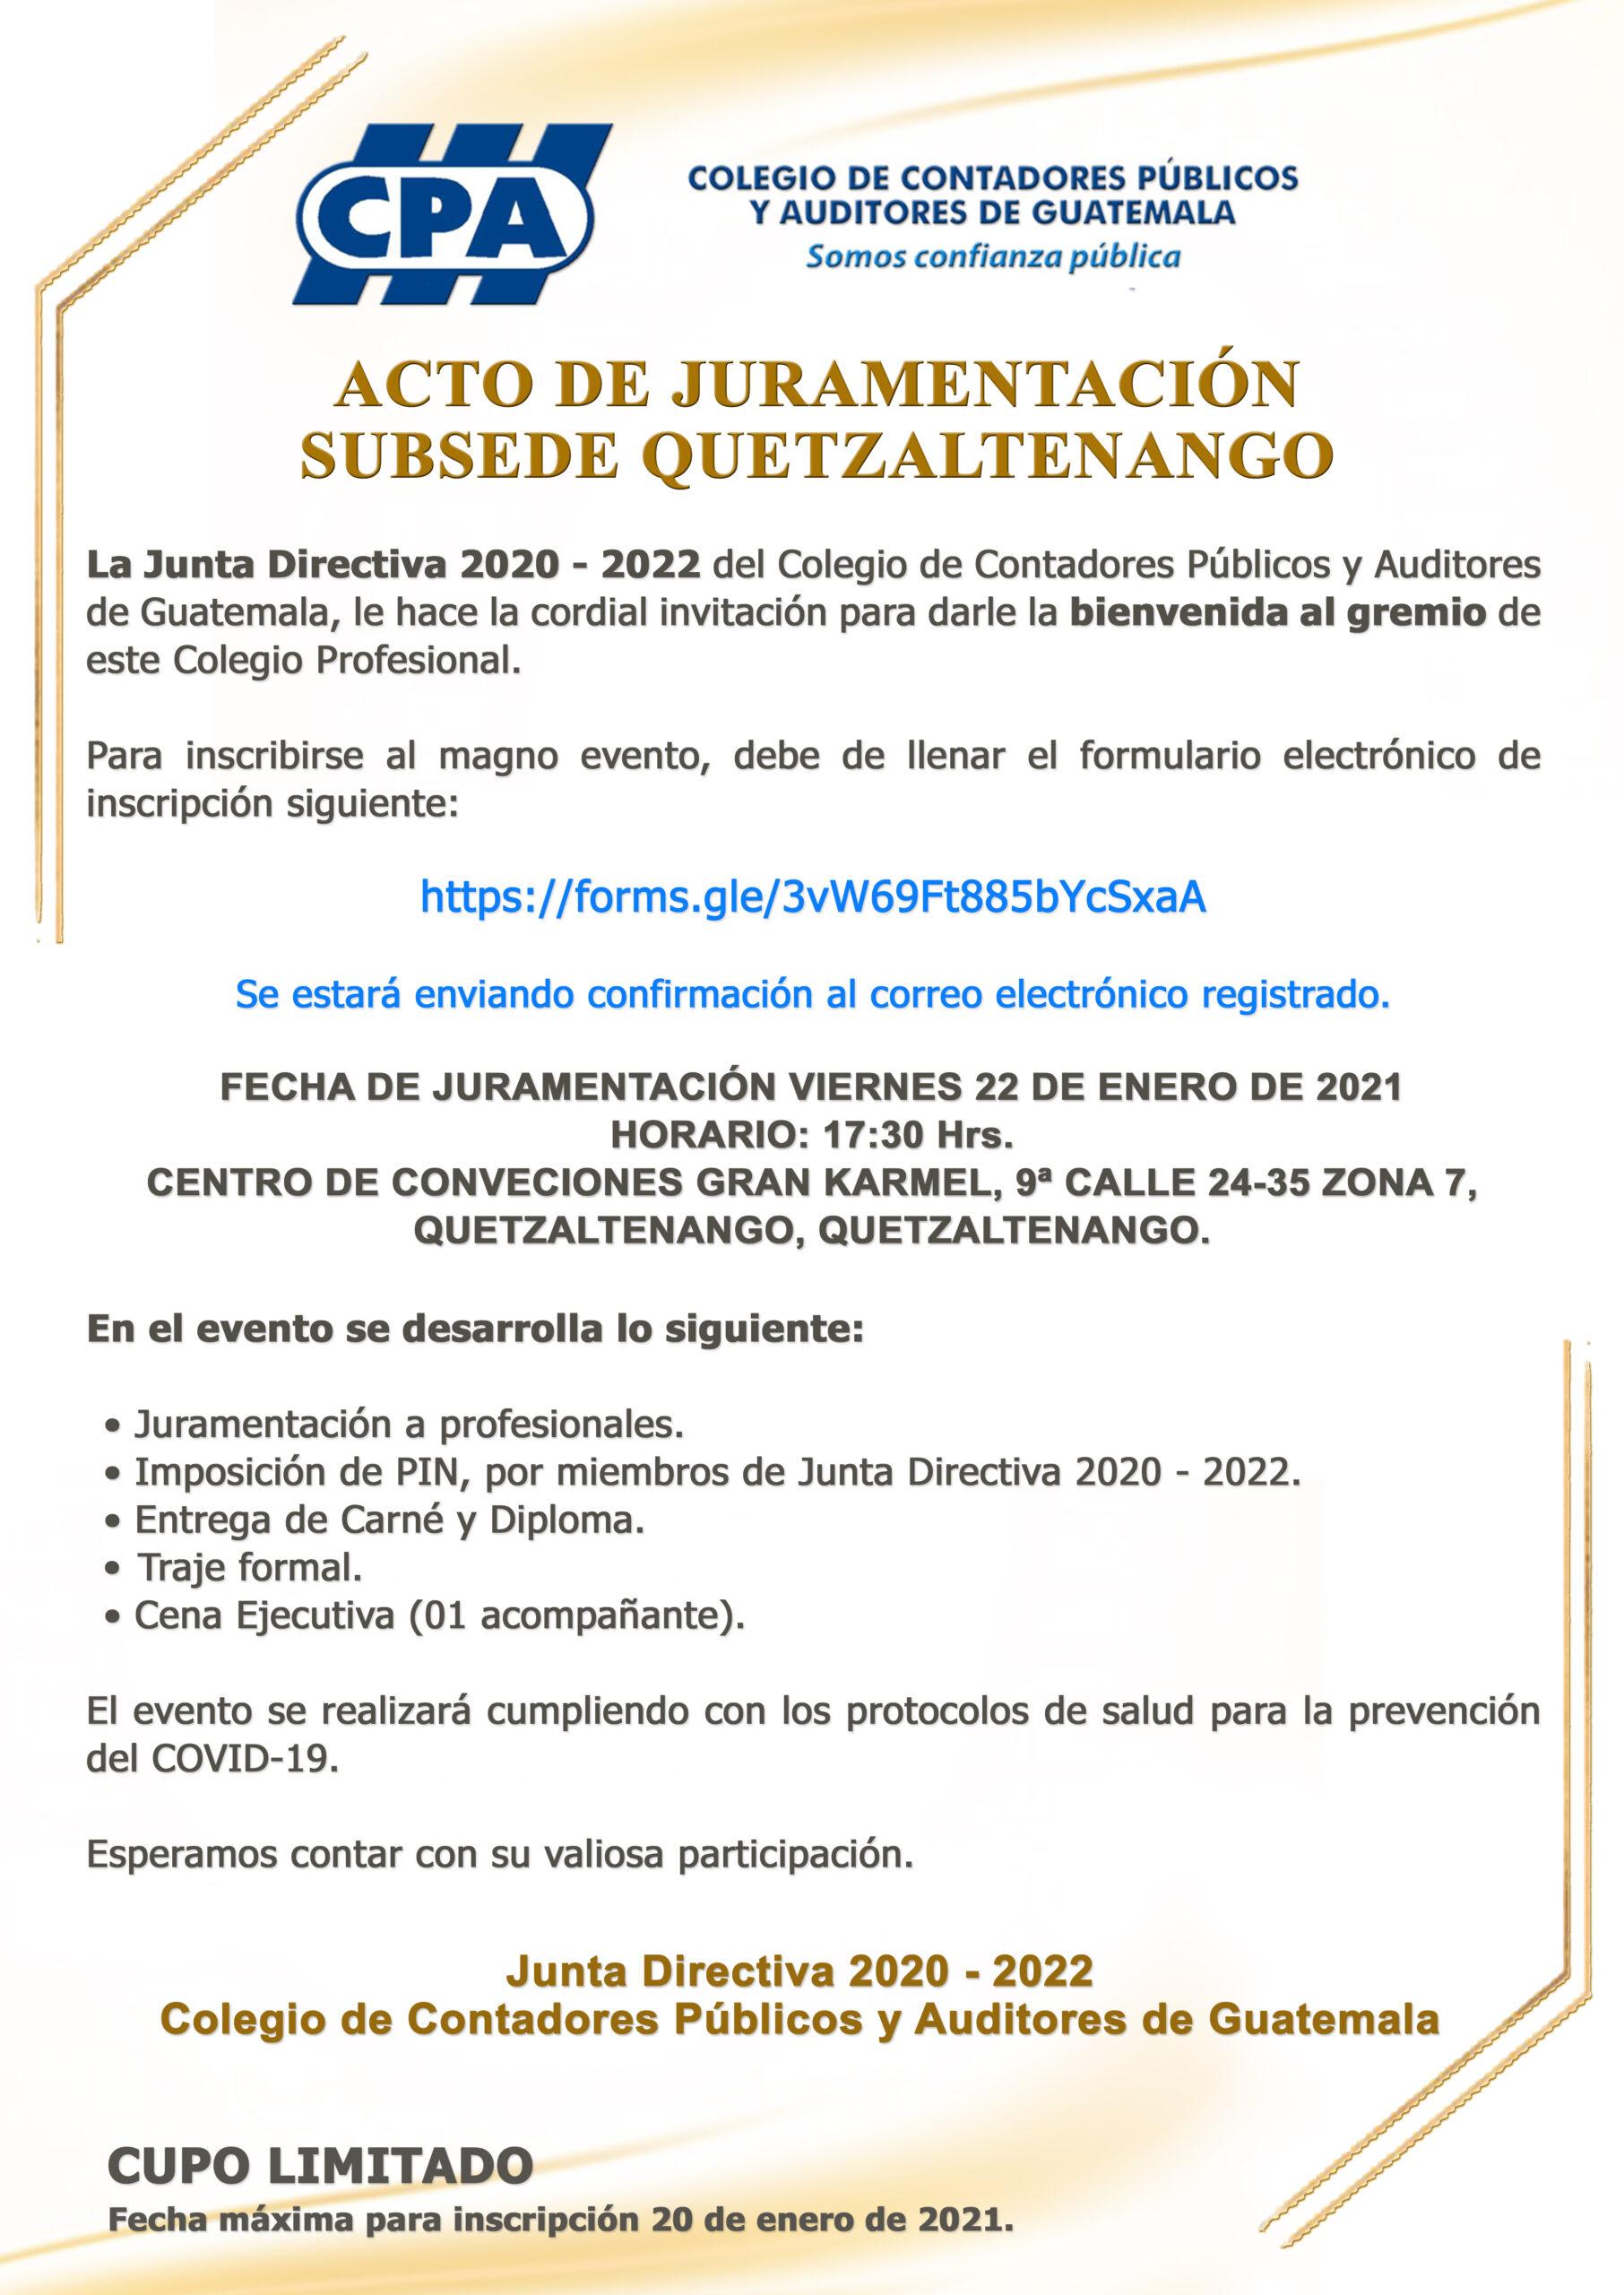 JURAMENTACIÓN | SUBSEDE QUETZALTENANGO | 22 ENERO 2021